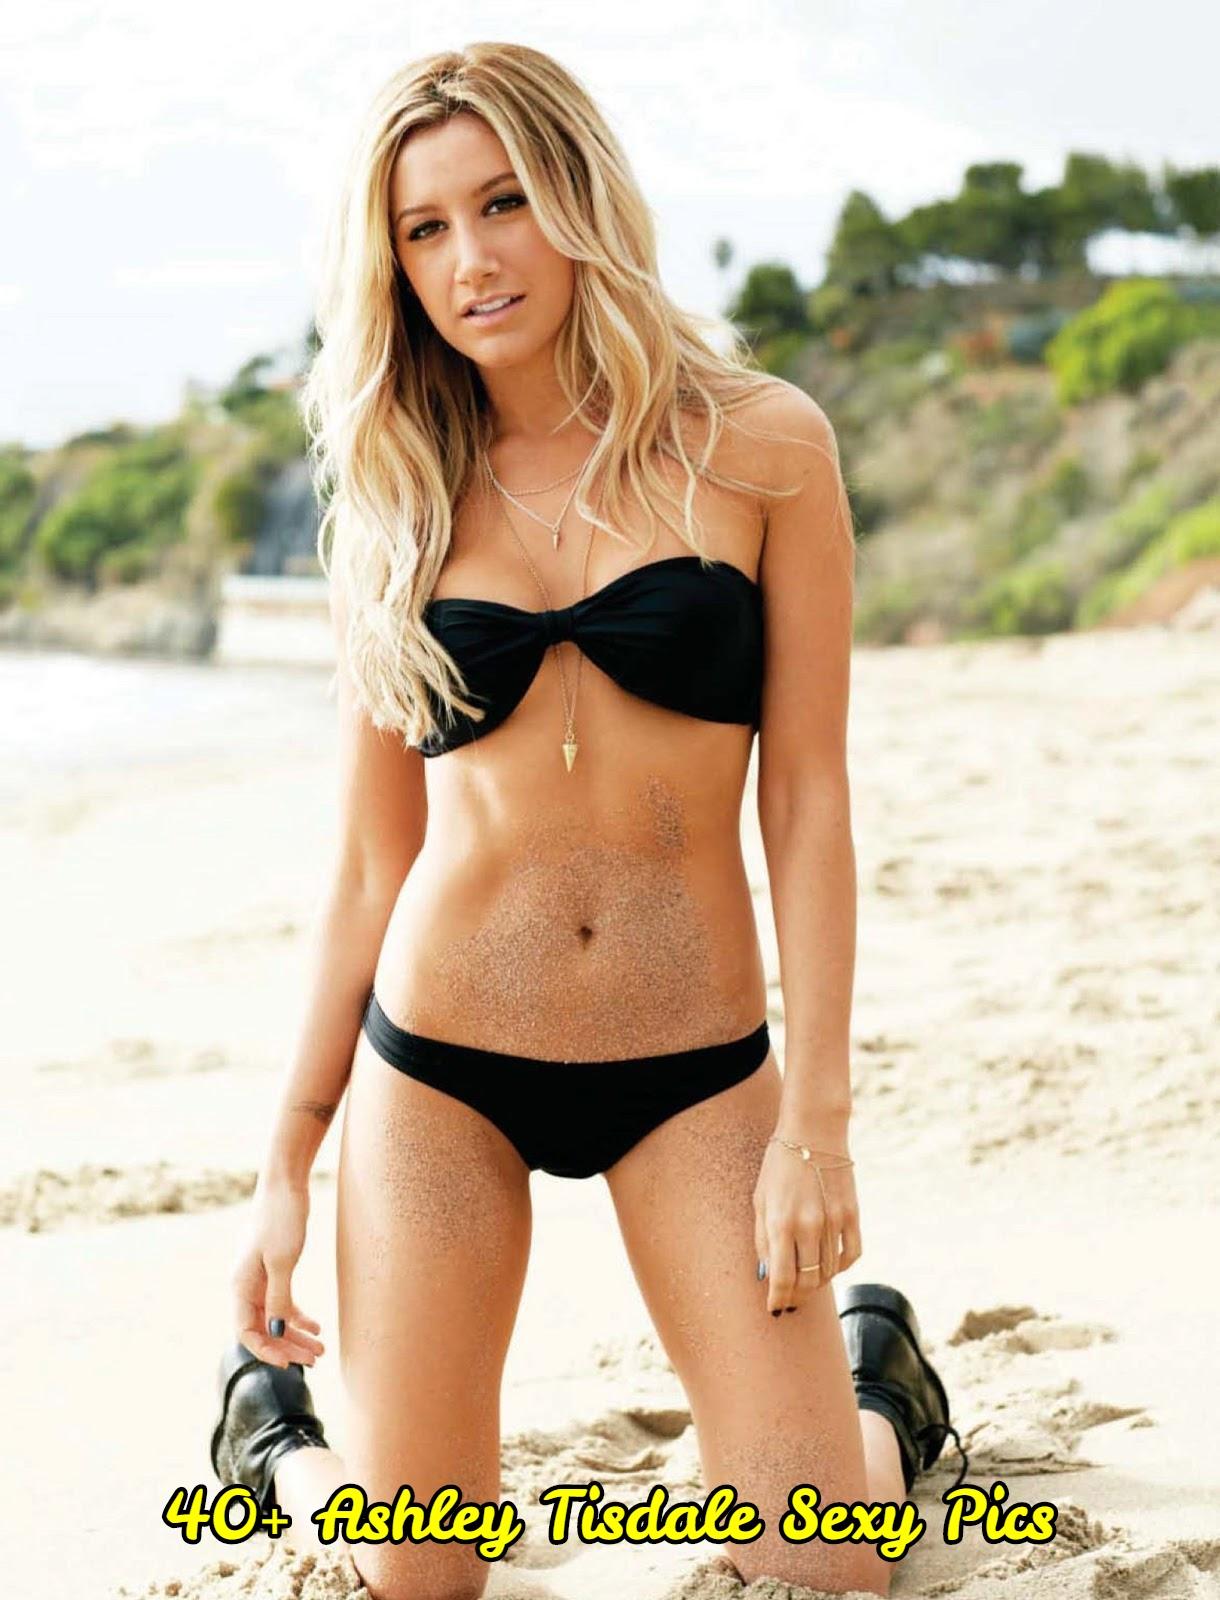 Ashley Tisdale Sexy Pic